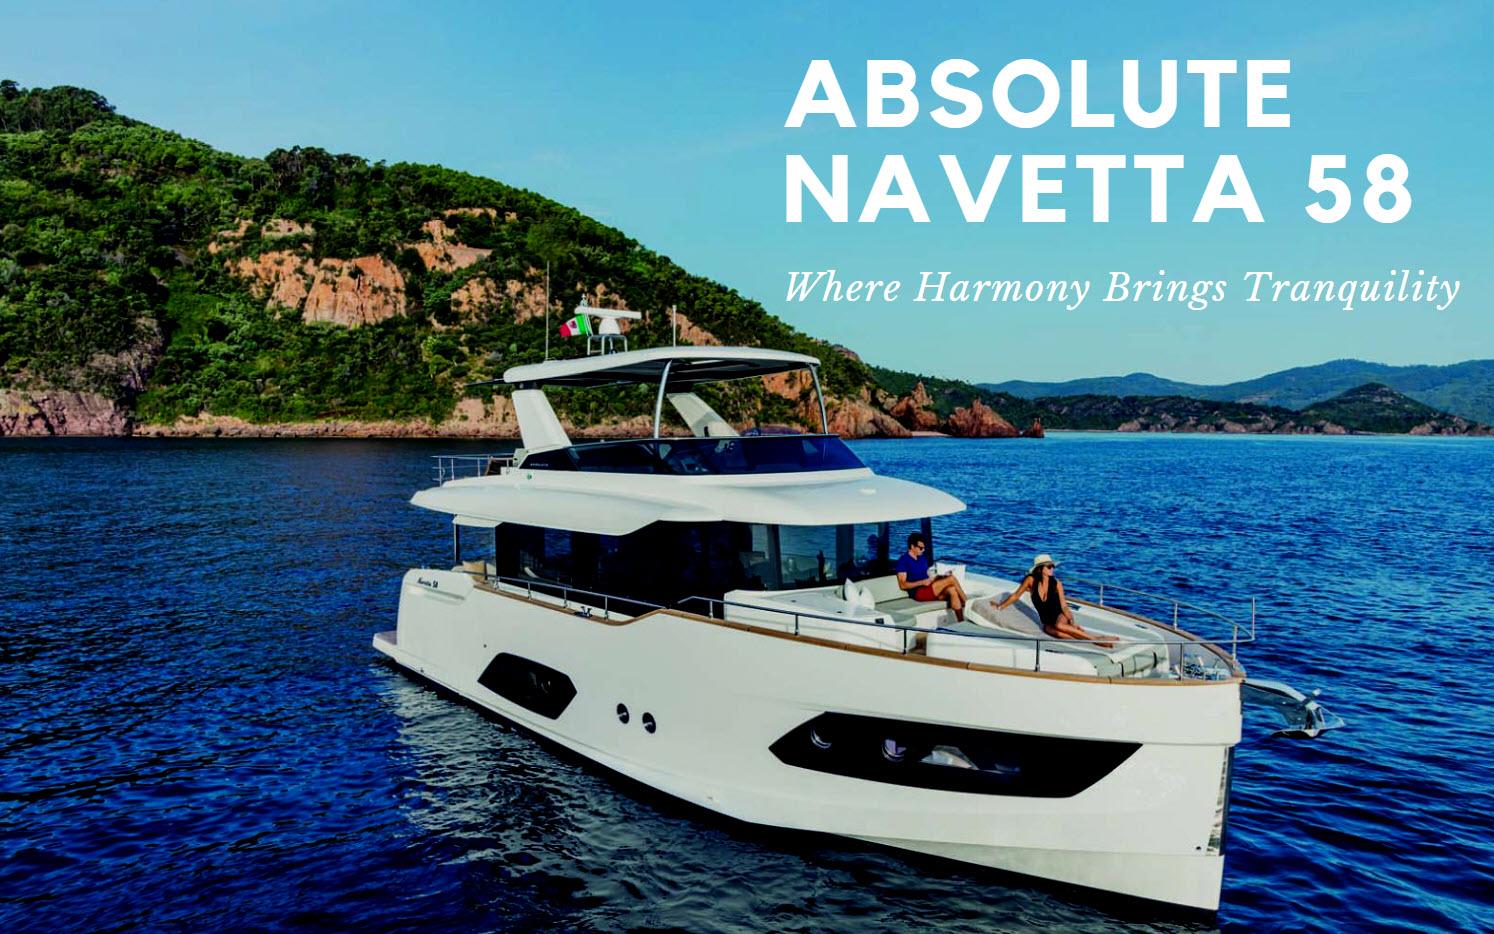 absolute yachts 58 navetta